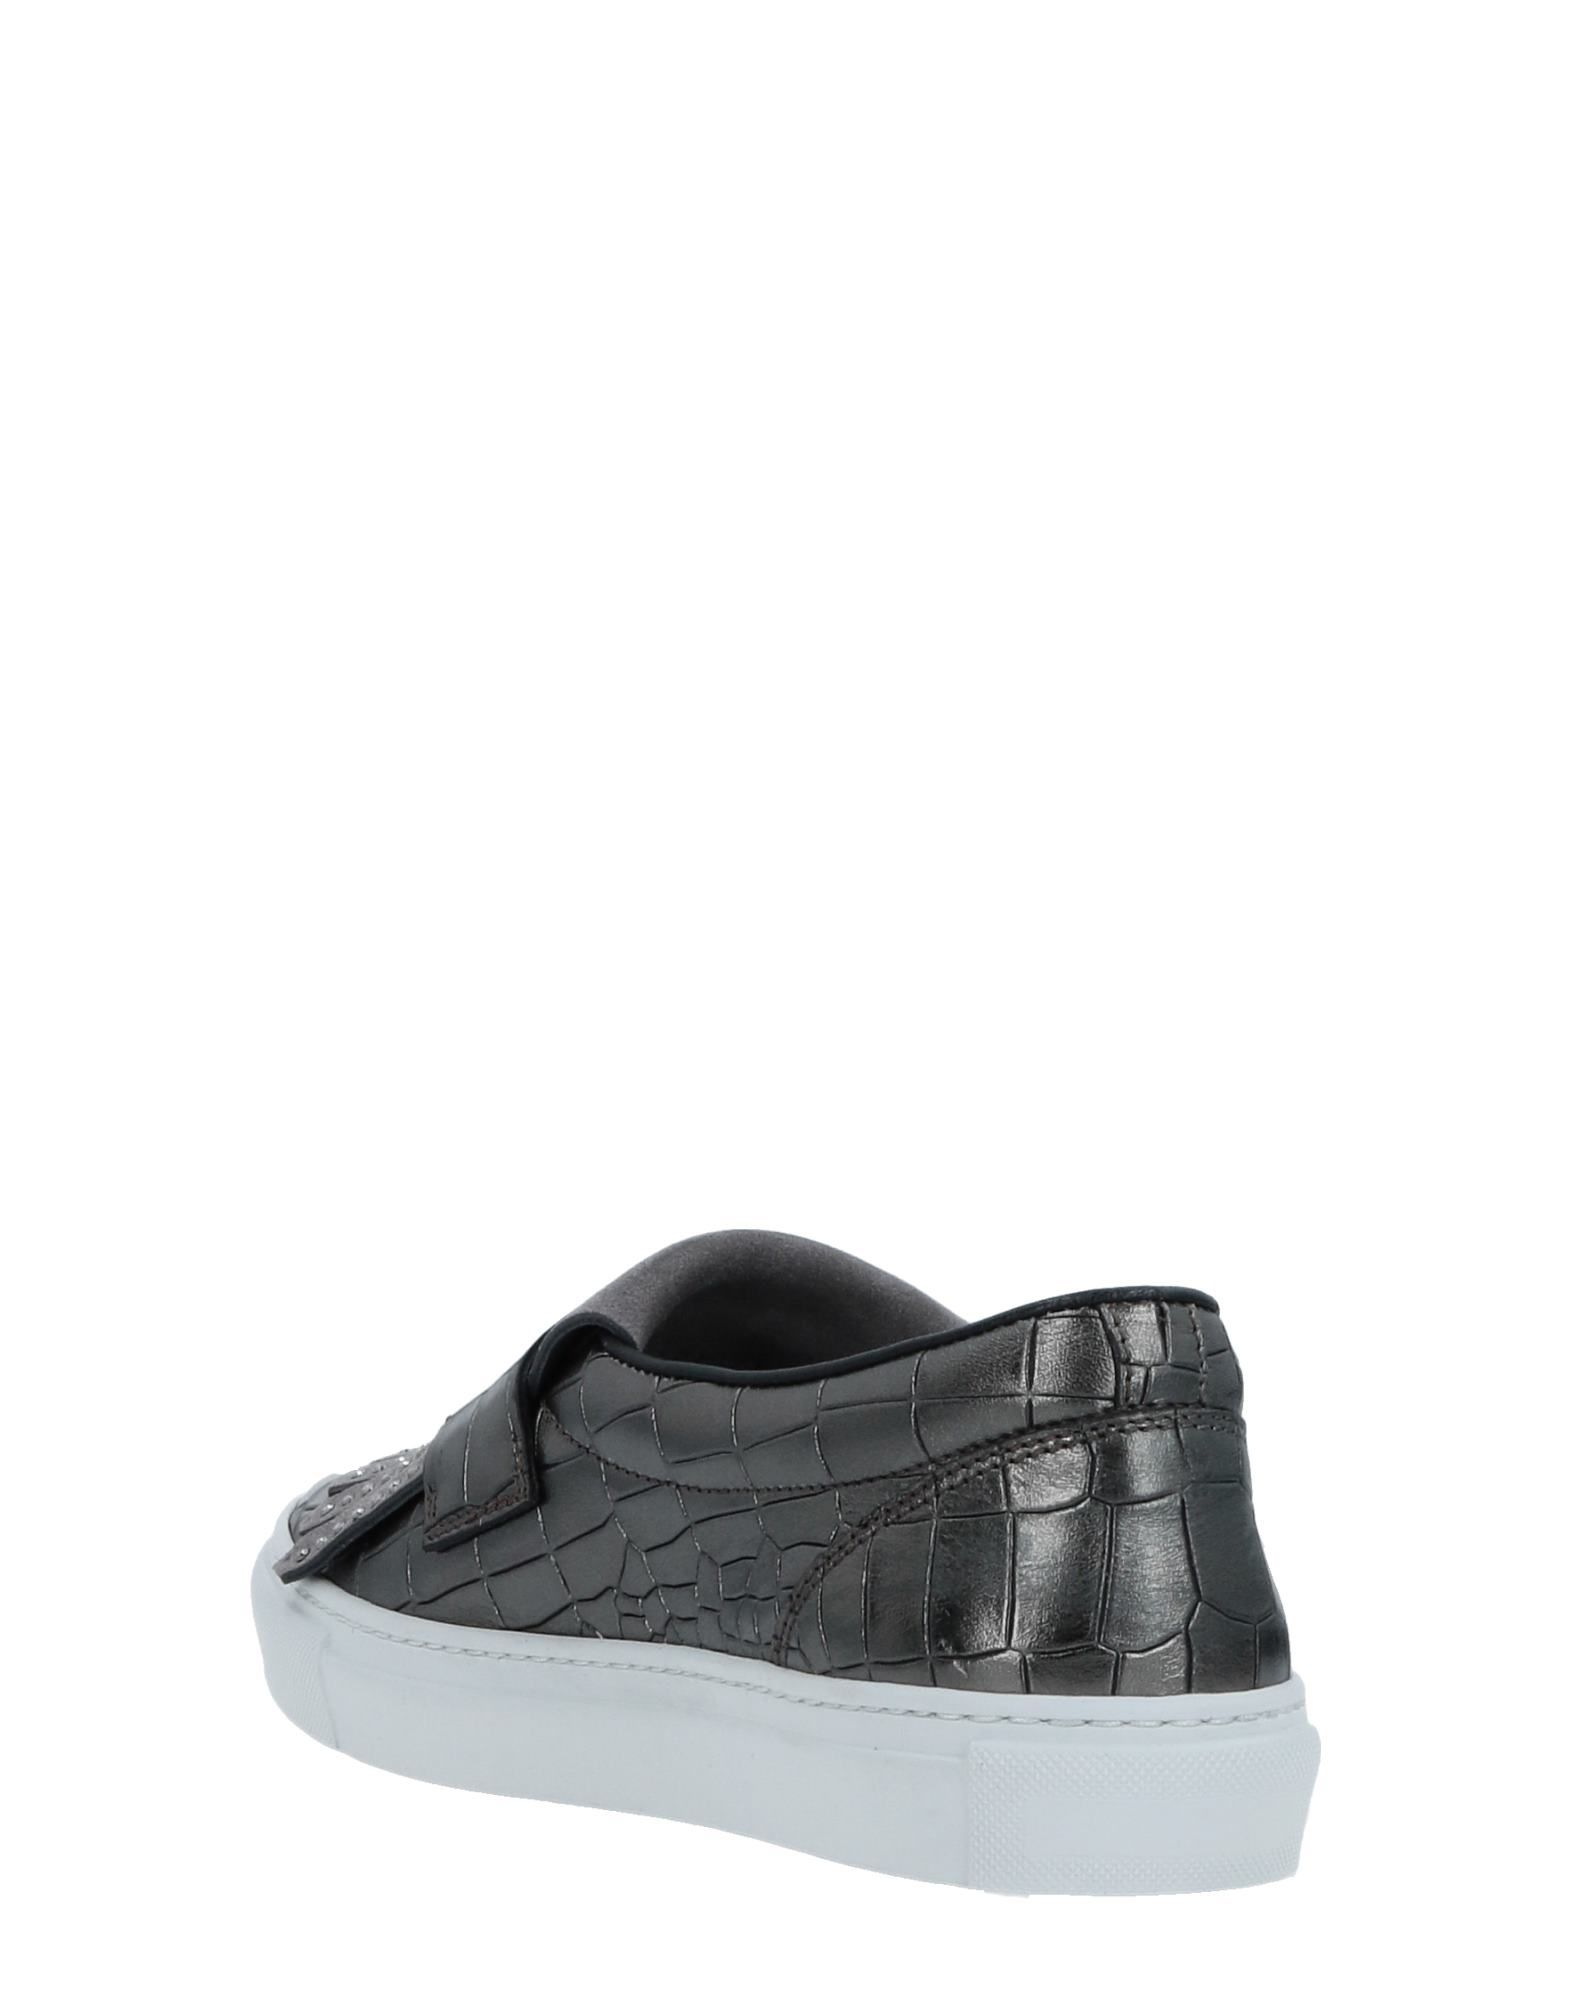 Rabatt Schuhe John Richmond Sneakers Damen  11515636BF